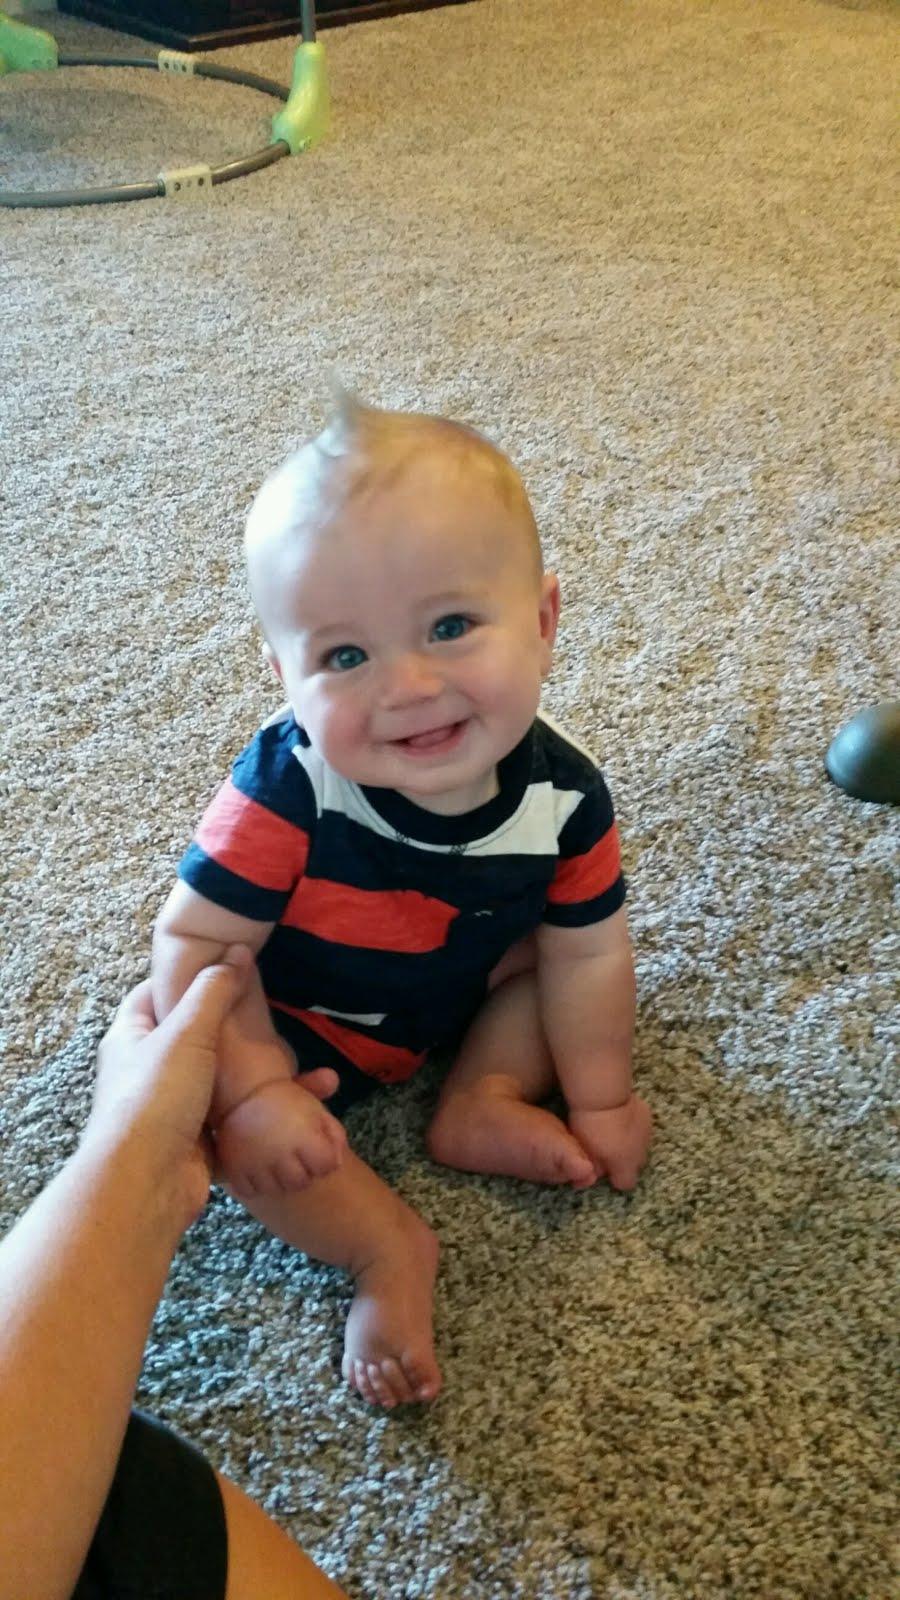 Radley - 6 months old